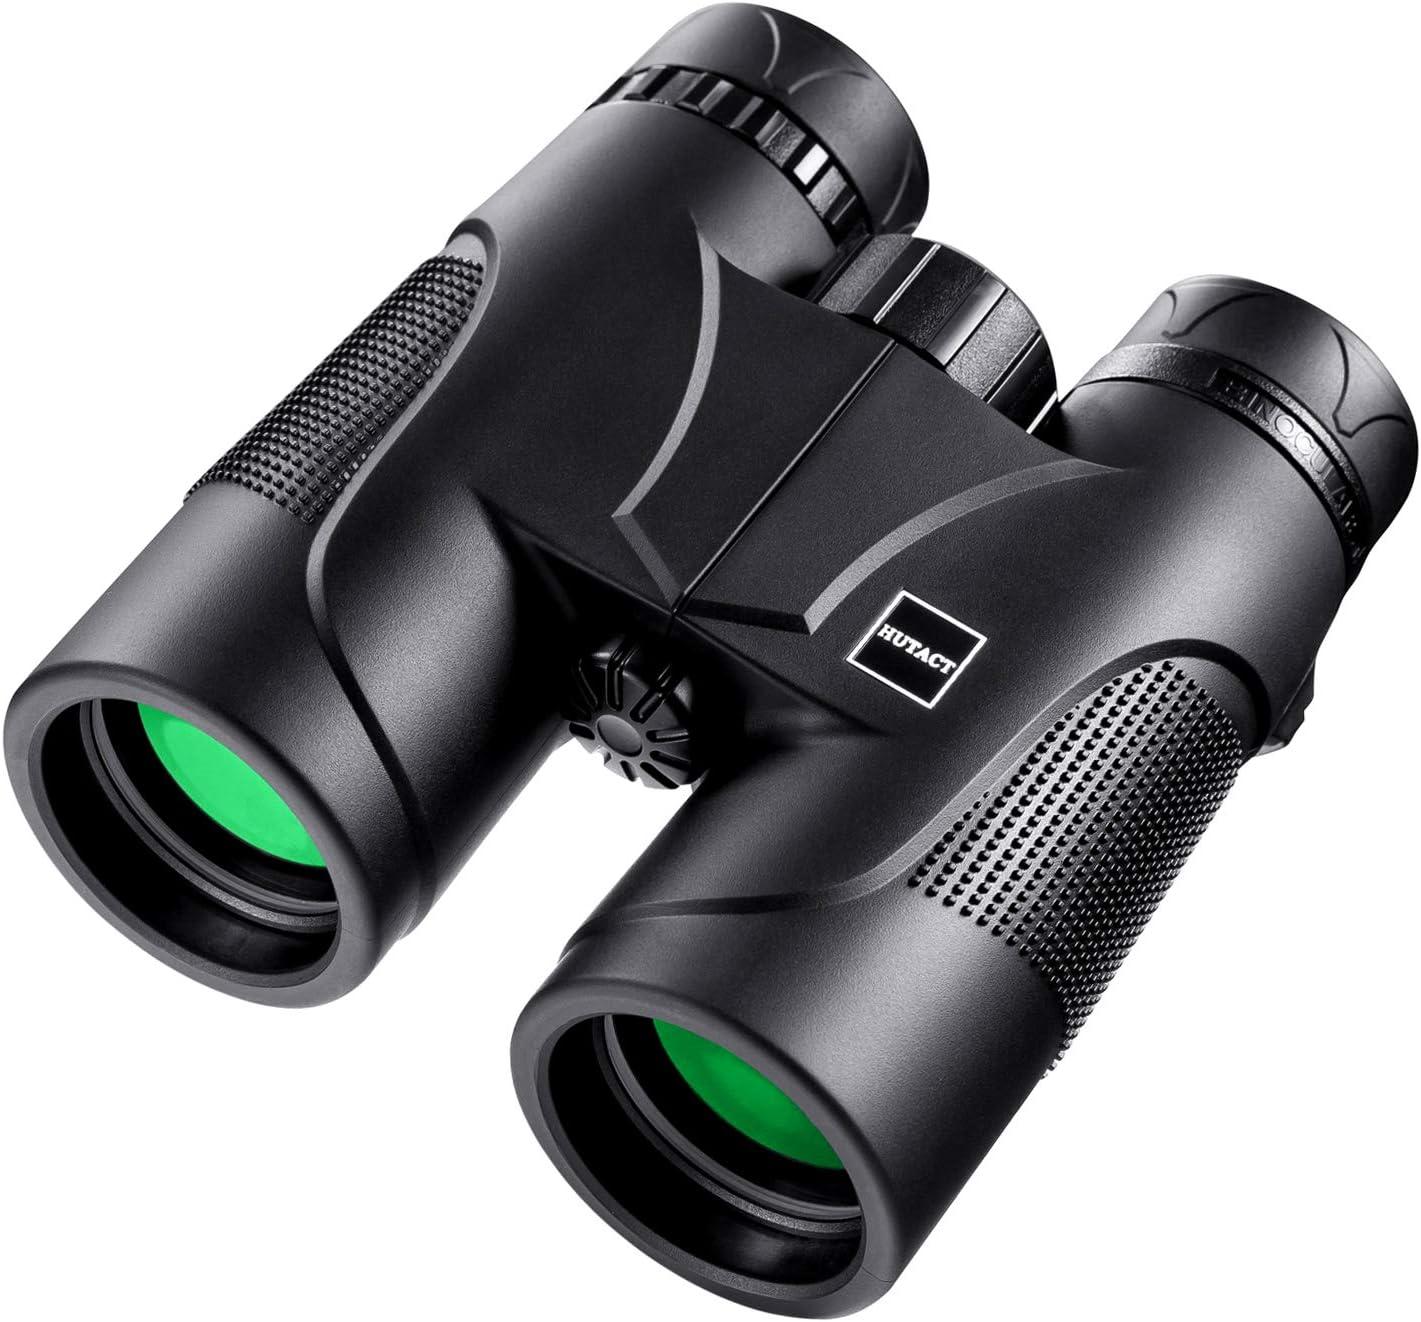 Hutact Fernglas Kompakt 10 42 Ferngläser Feldstecher Kamera